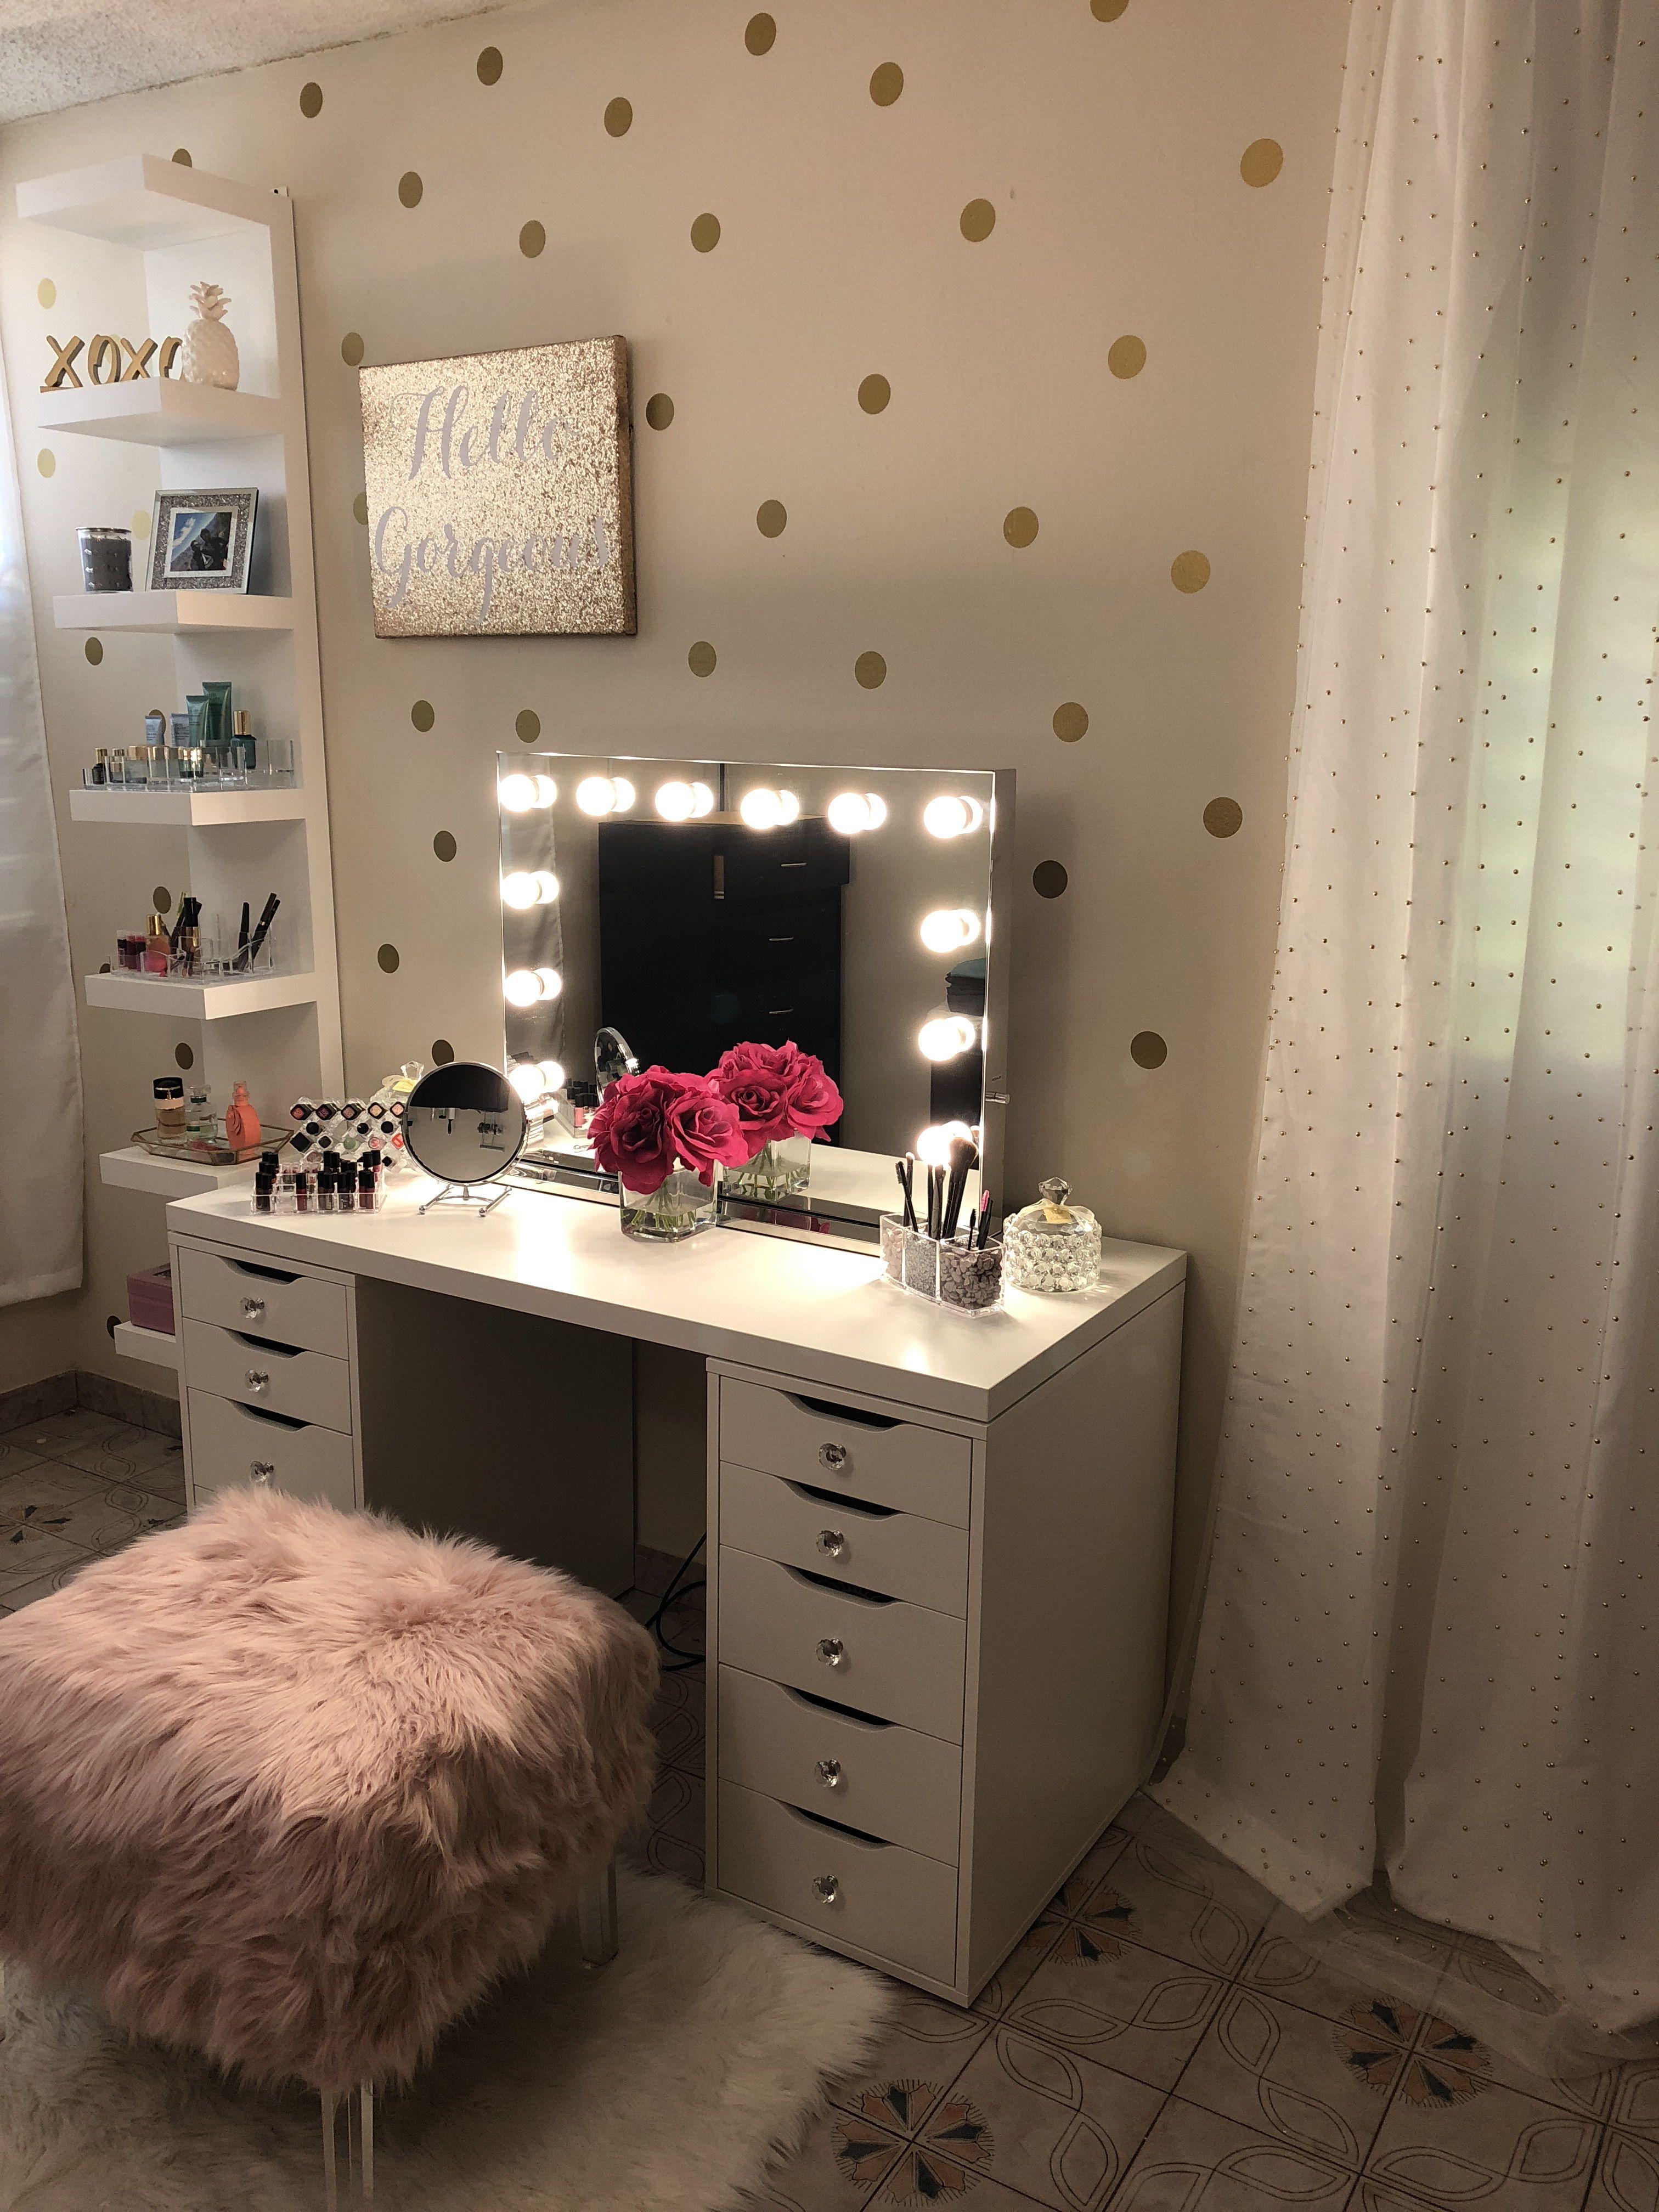 Design Your Own Room: Room Decor, Decor, Dream Rooms